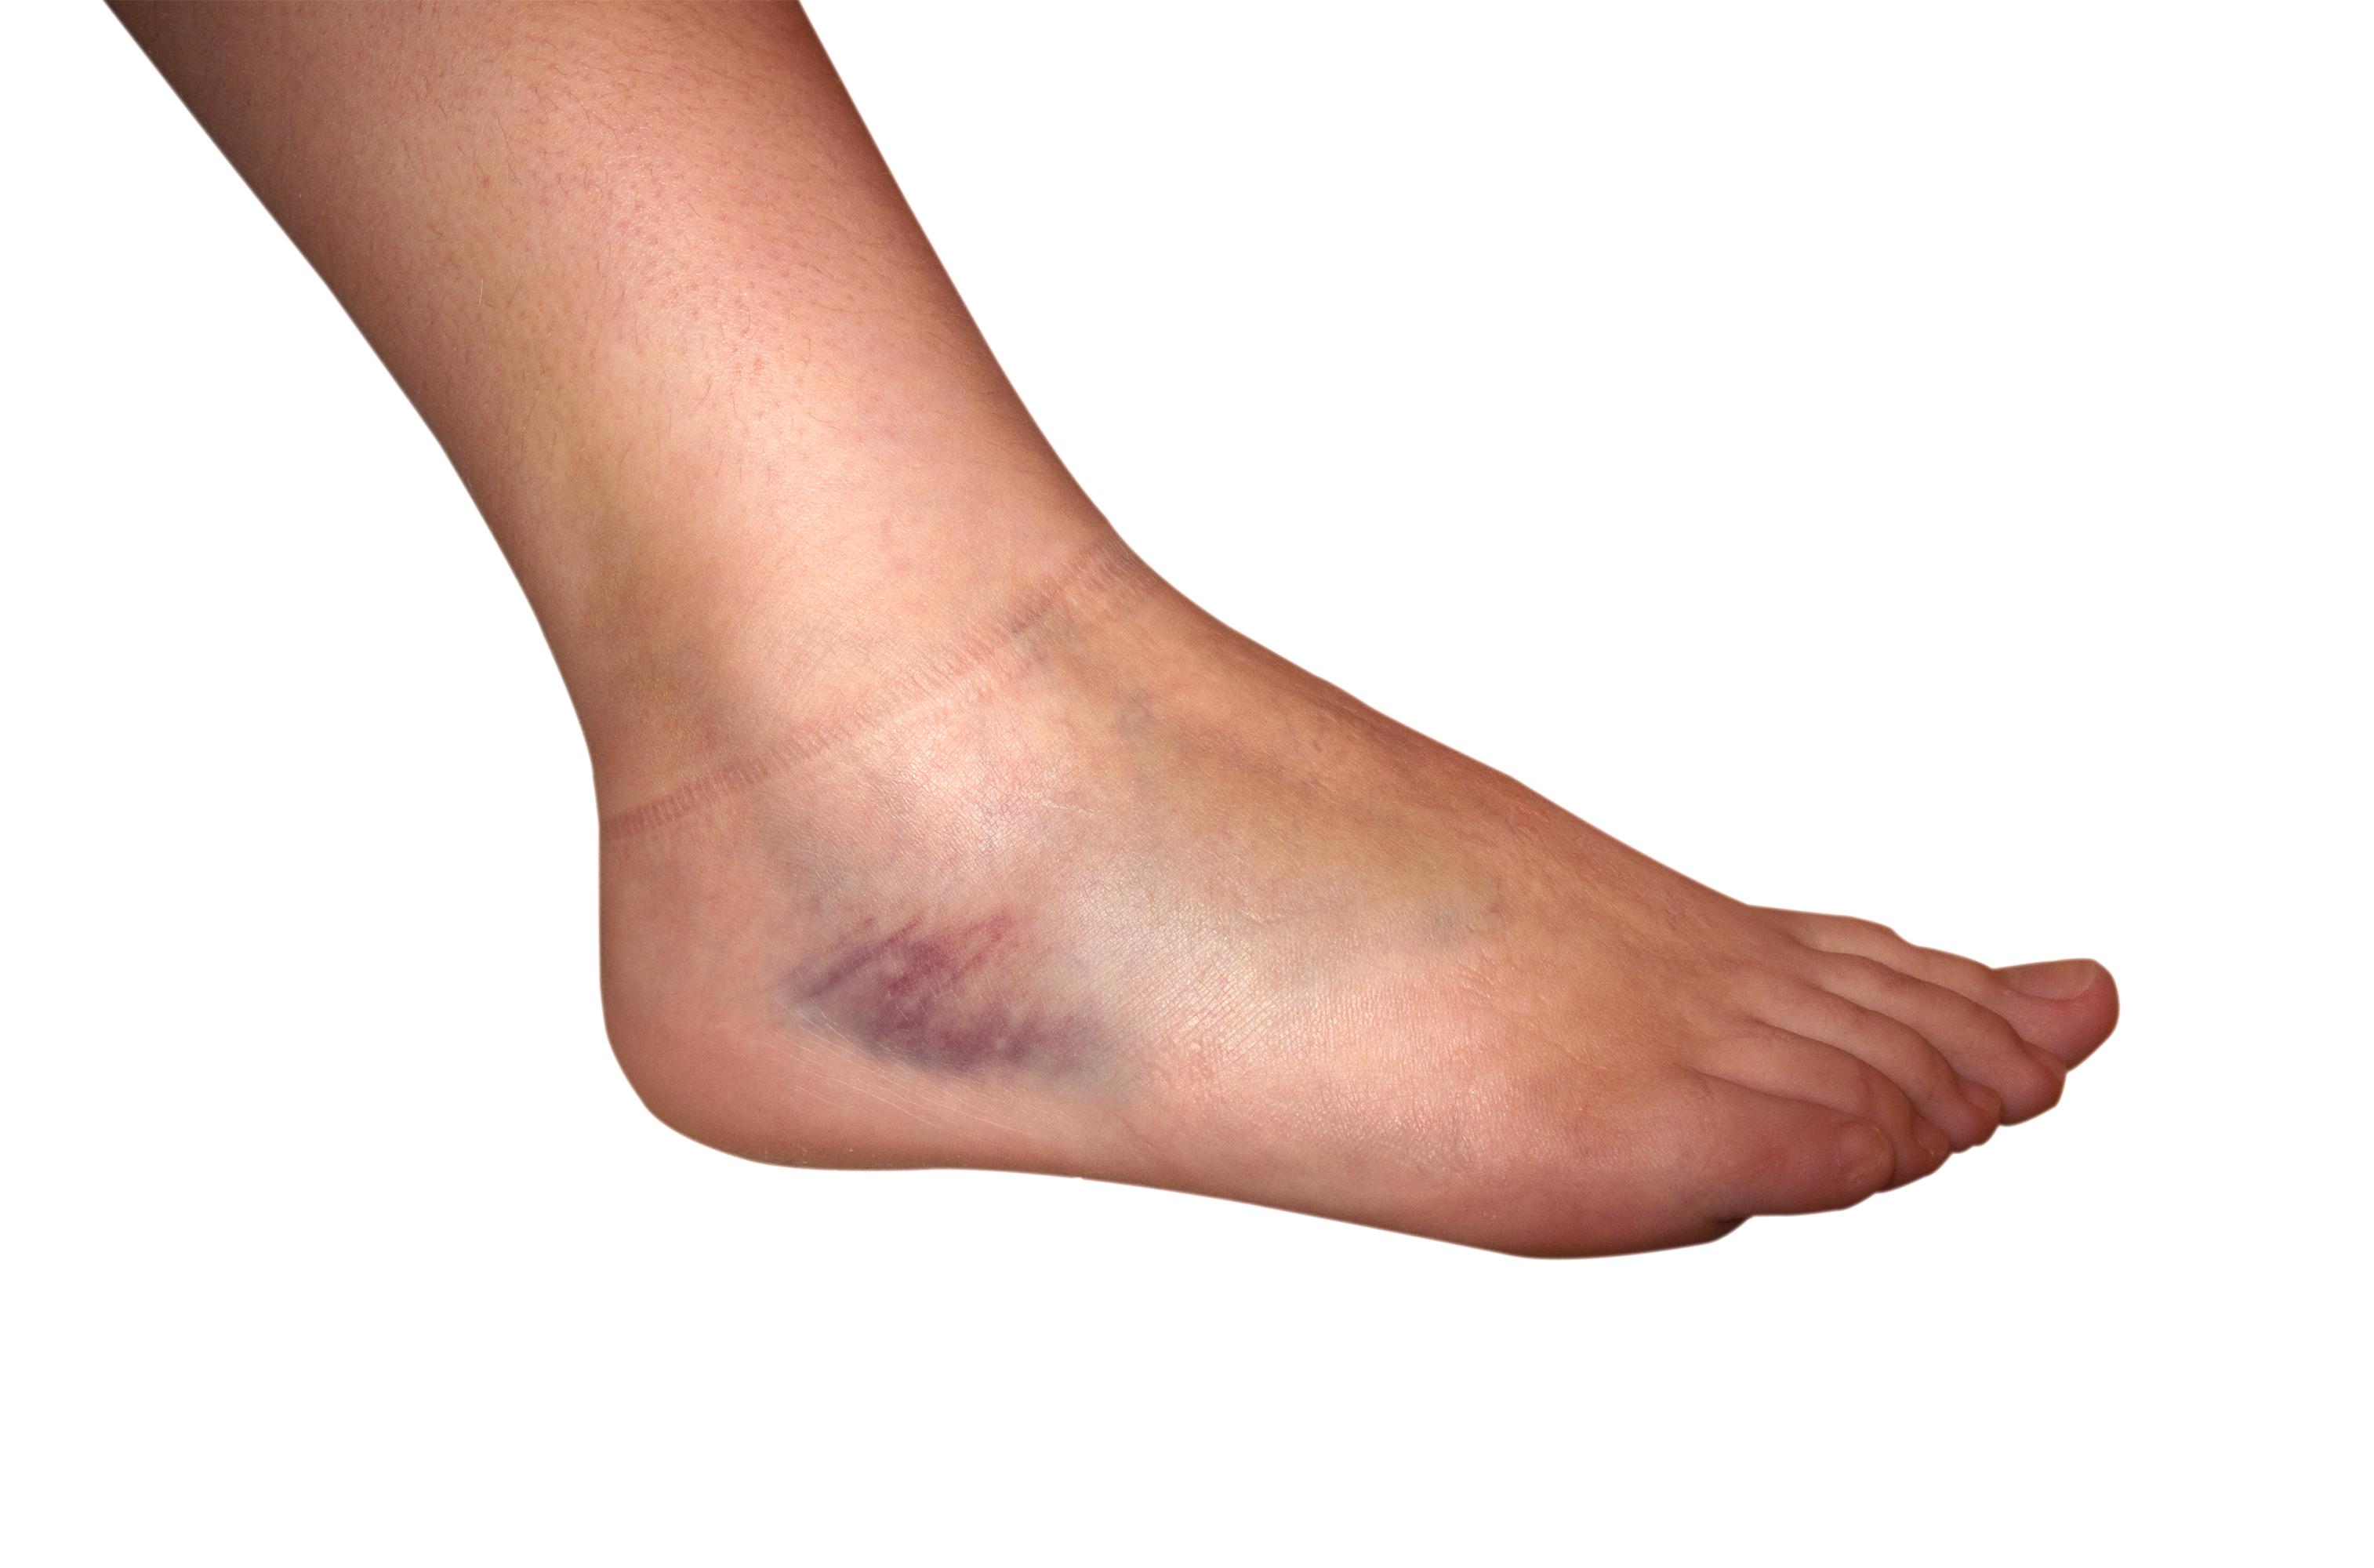 svullnad under foten